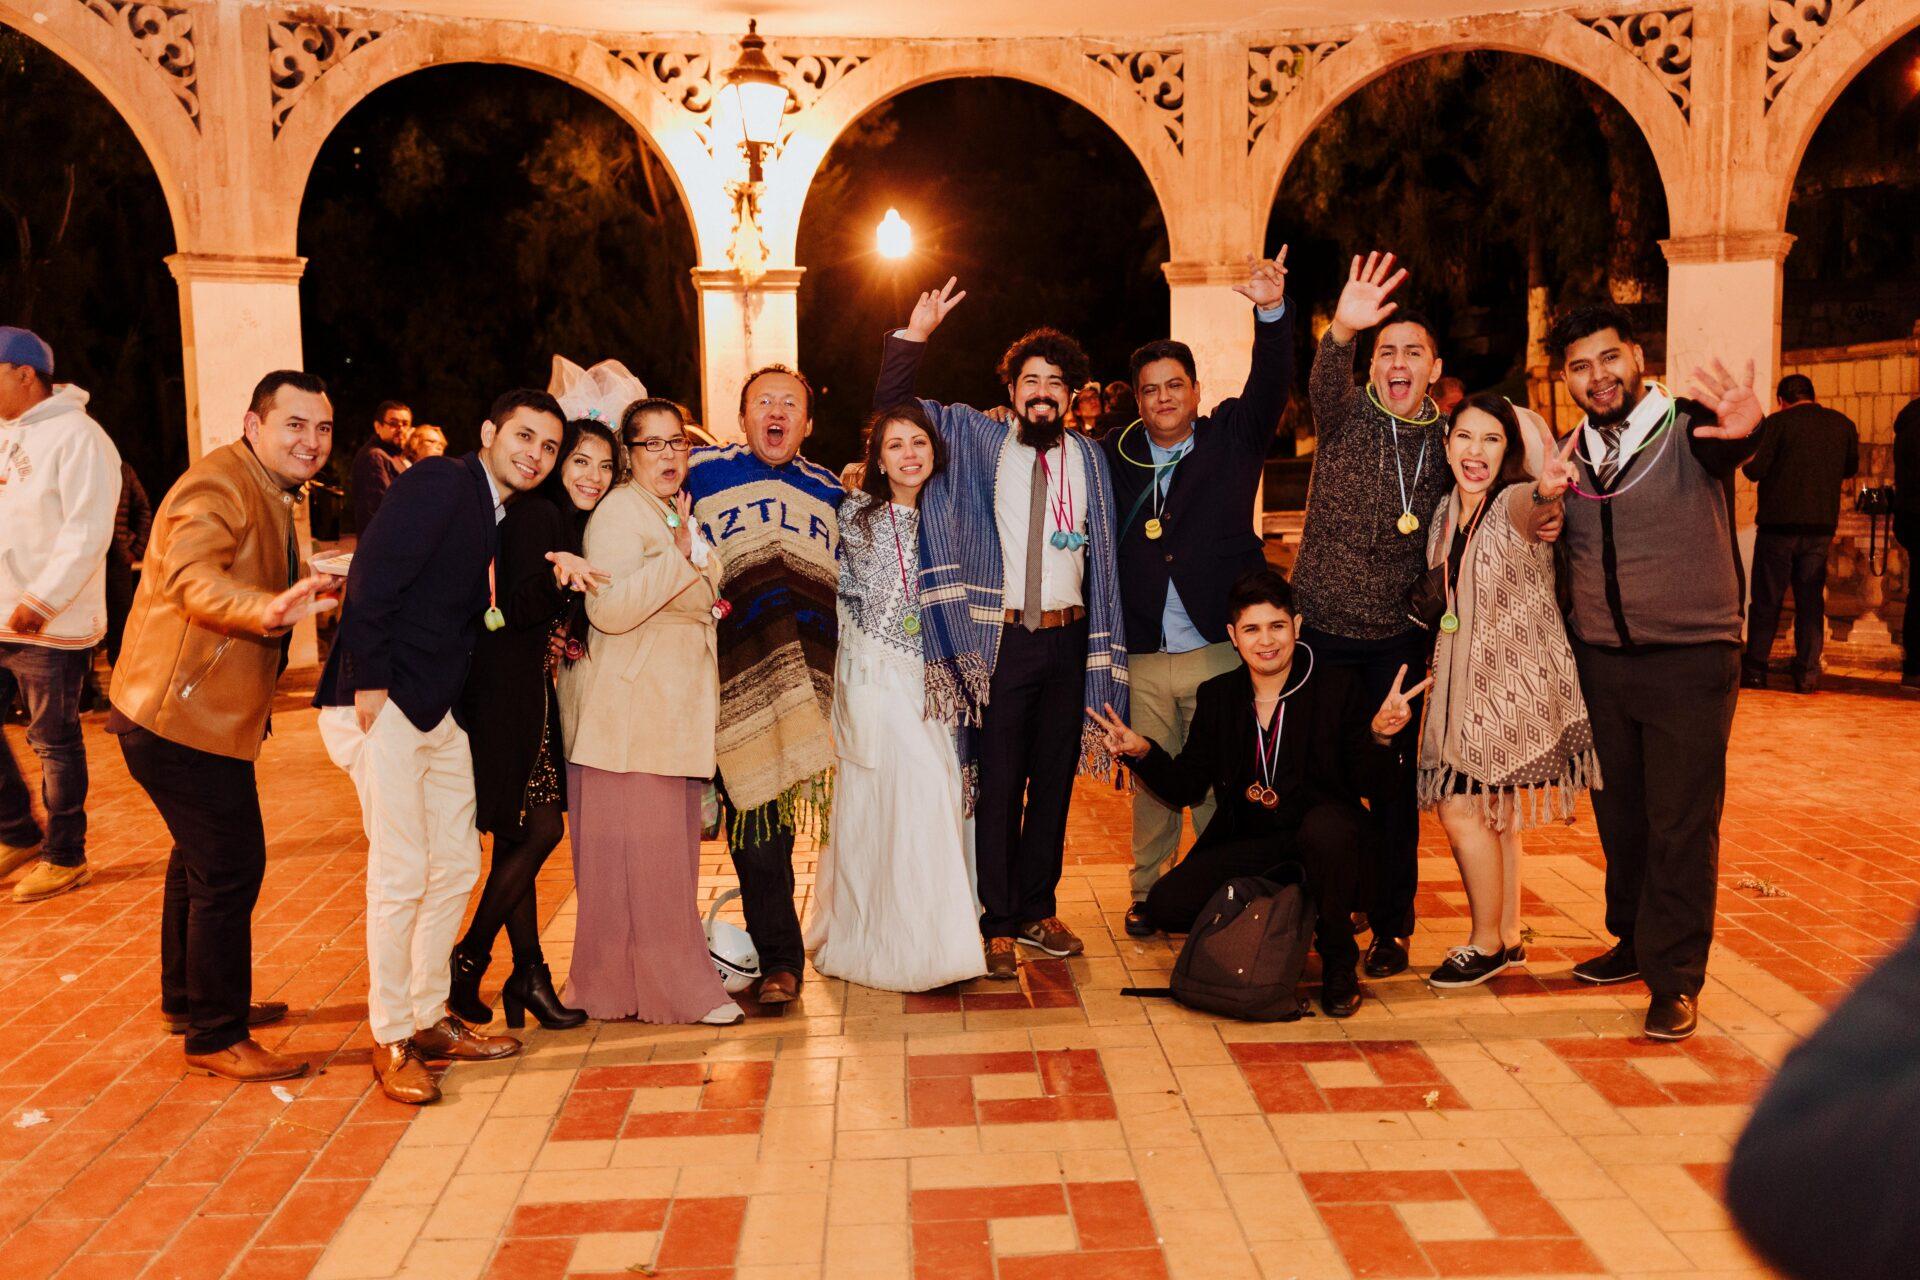 javier_noriega_fotografo_bodas_la_mina_club_zacatecas_wedding_photographer49